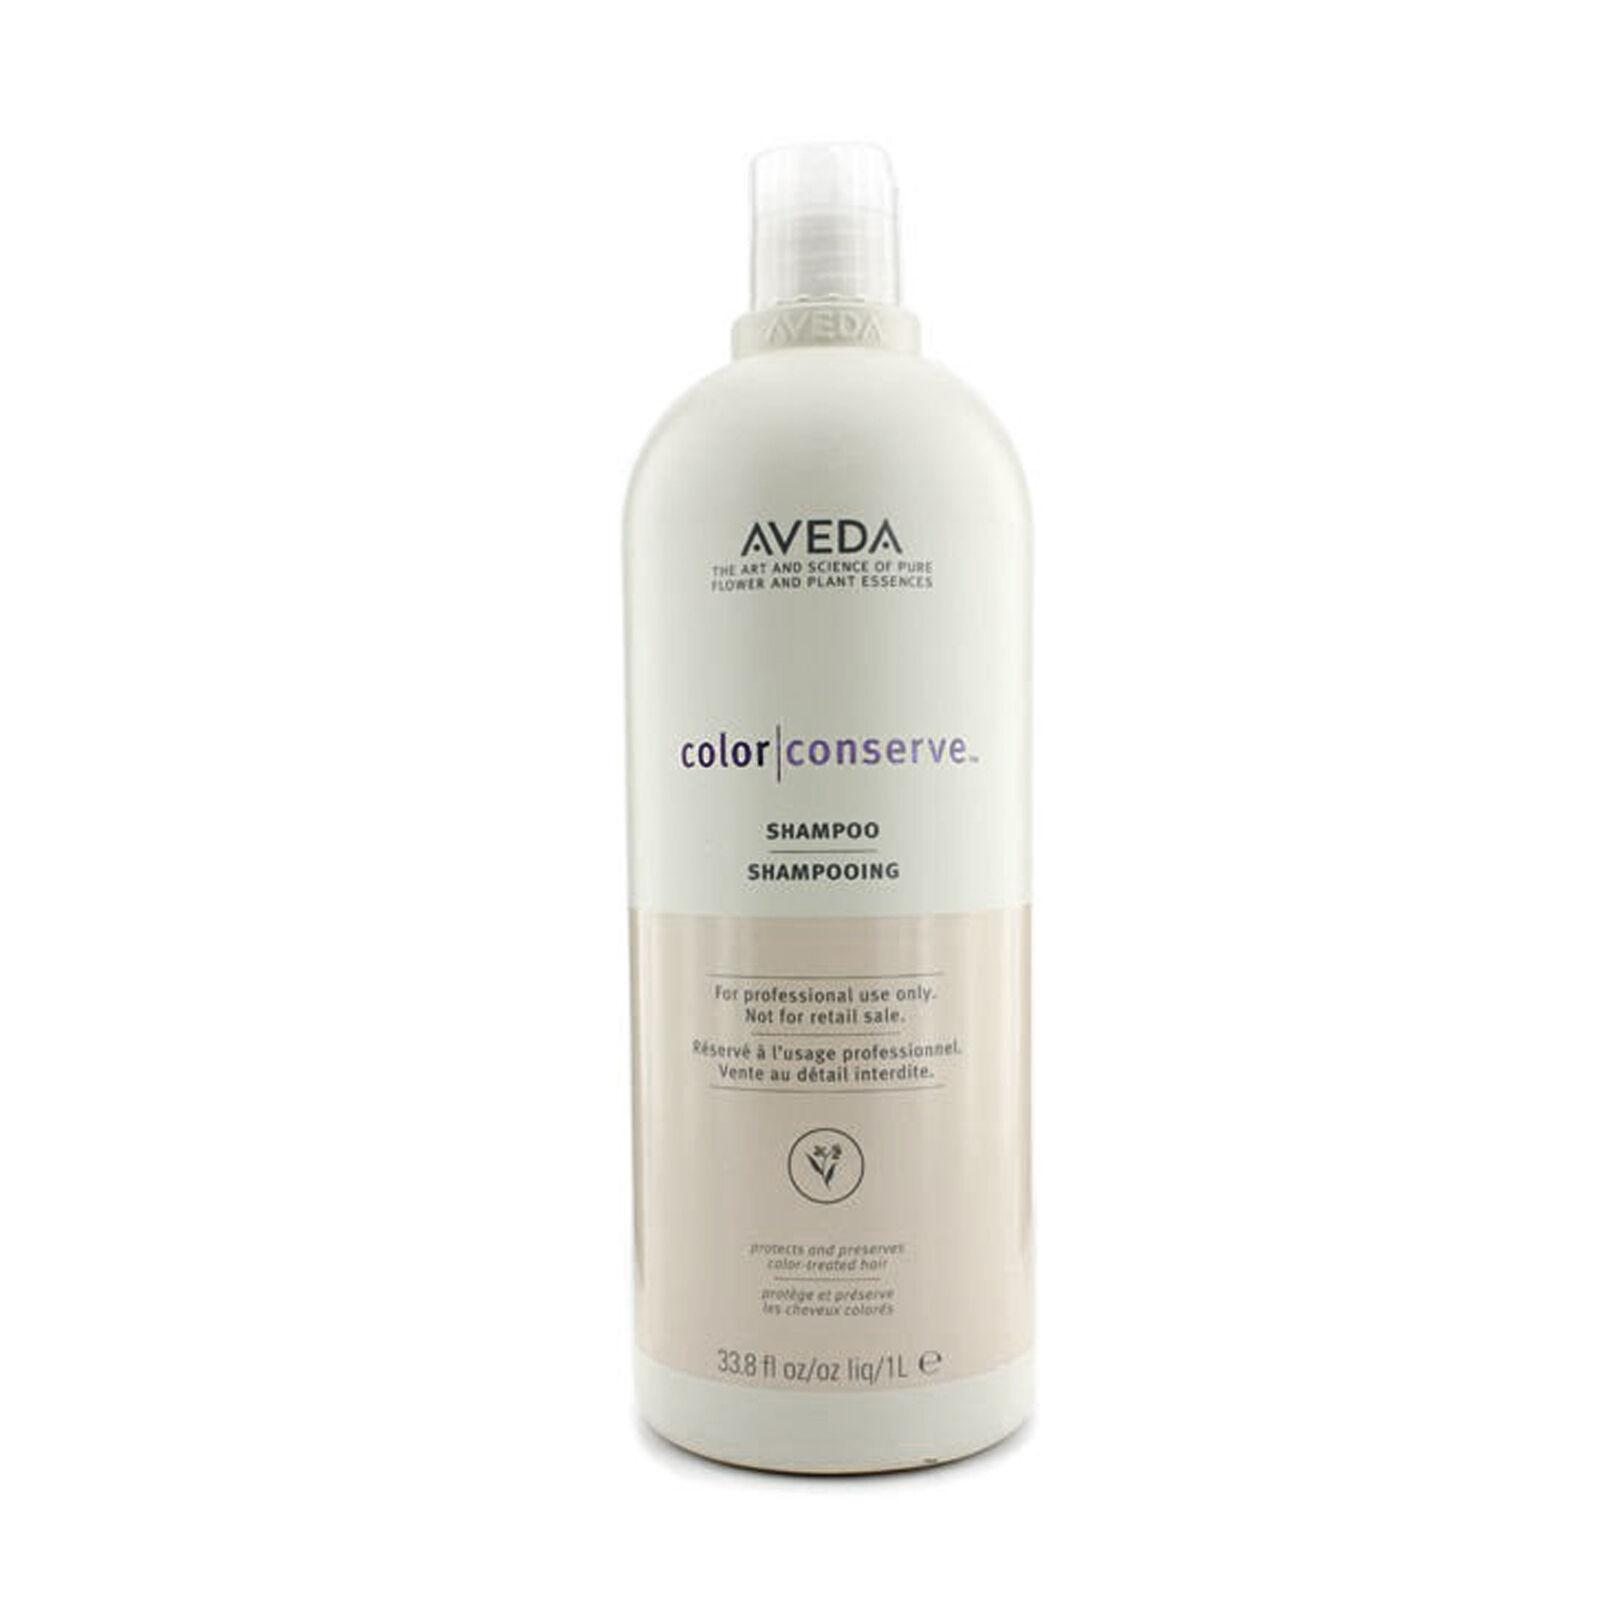 Aveda Color Conserve Shampoo 33.8 oz / 1 liter BB